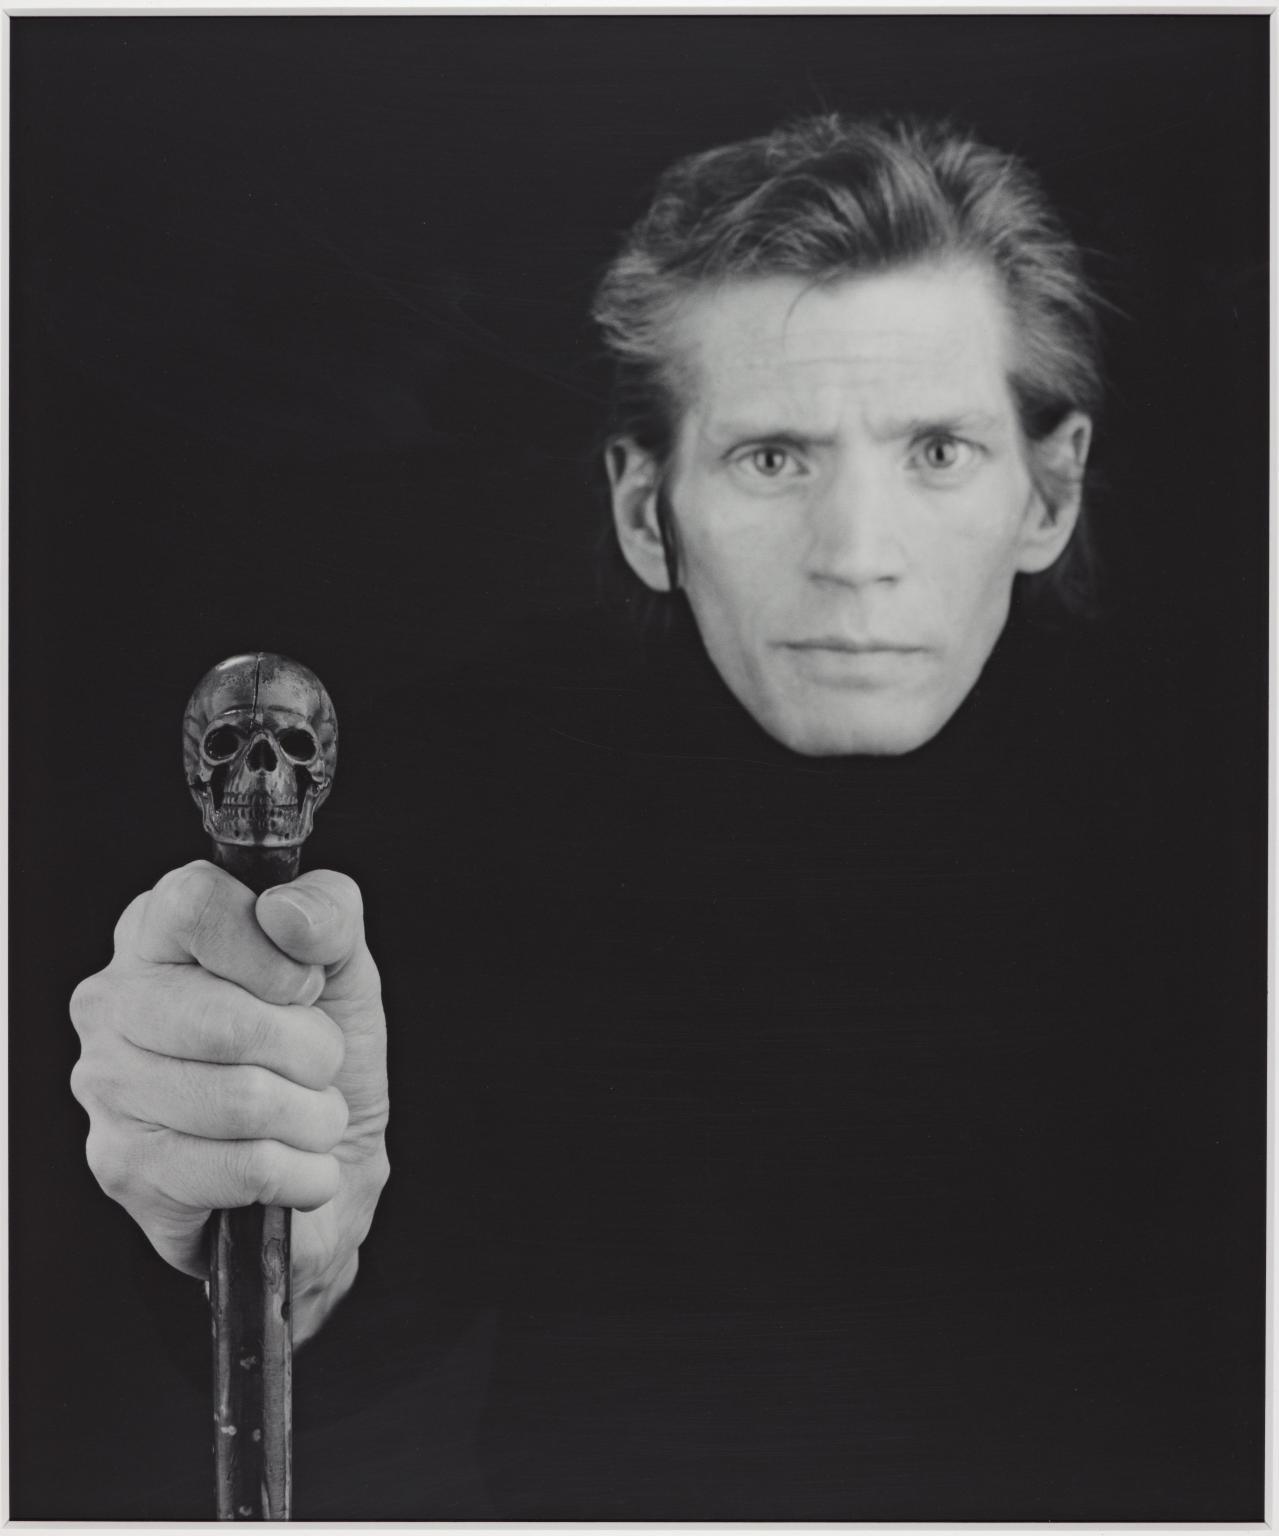 Self-Portrait, 1988 © Robert Mapplethorpe Foundation.